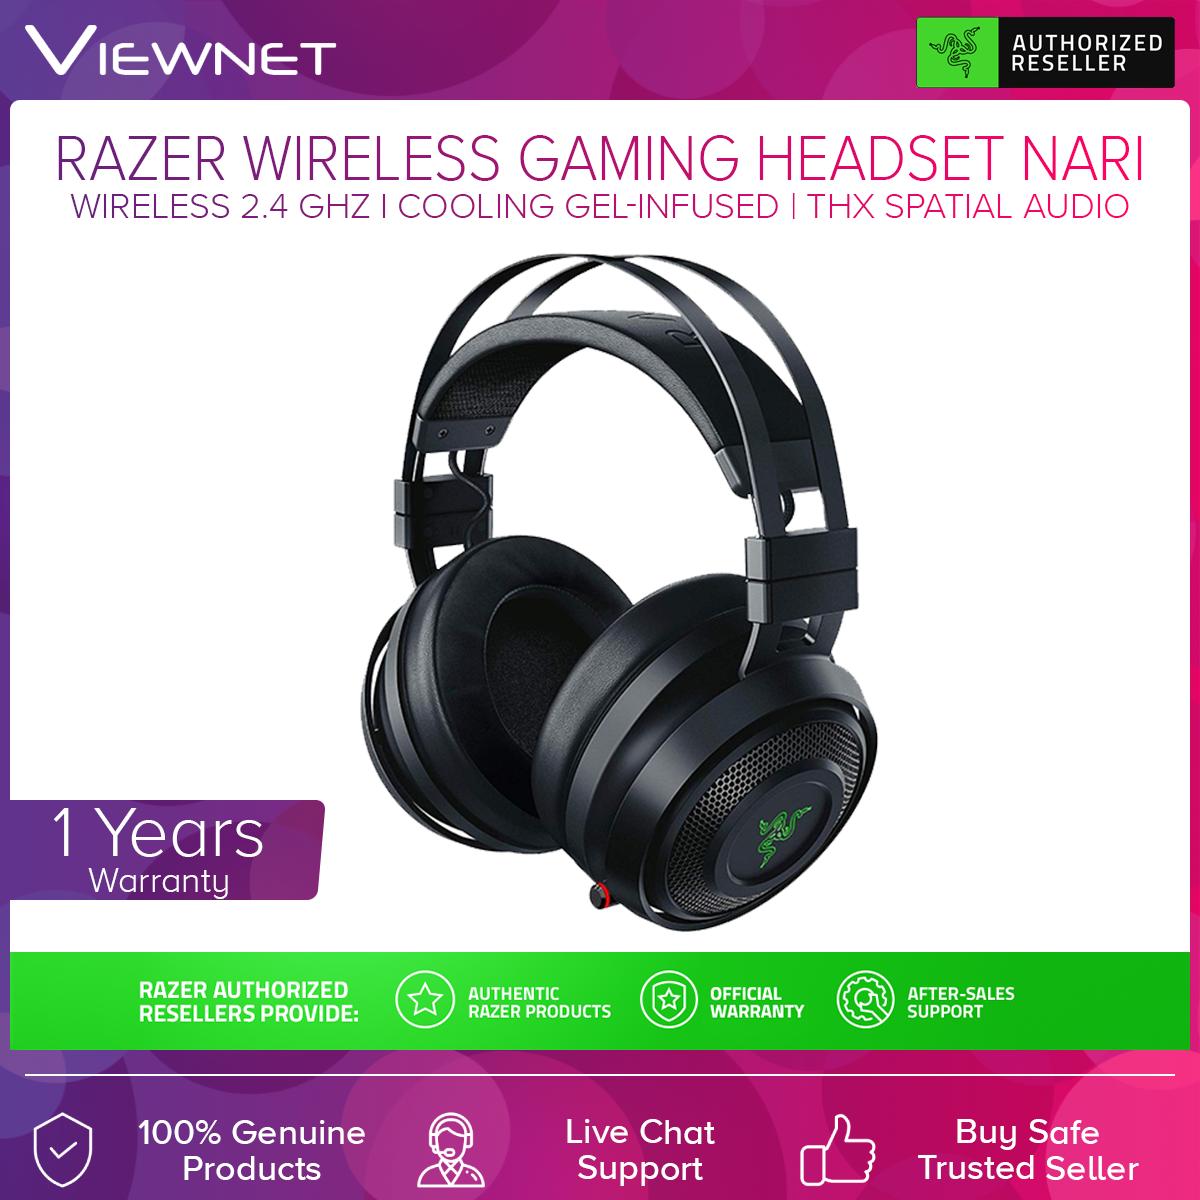 Razer Nari Wireless Gaming Headset (RZ04-02680100-R3M1), THX Spatial Audio, Razer Chroma, Cooling Gel-Infused Cushions, 2.4GHz Wireless Audio